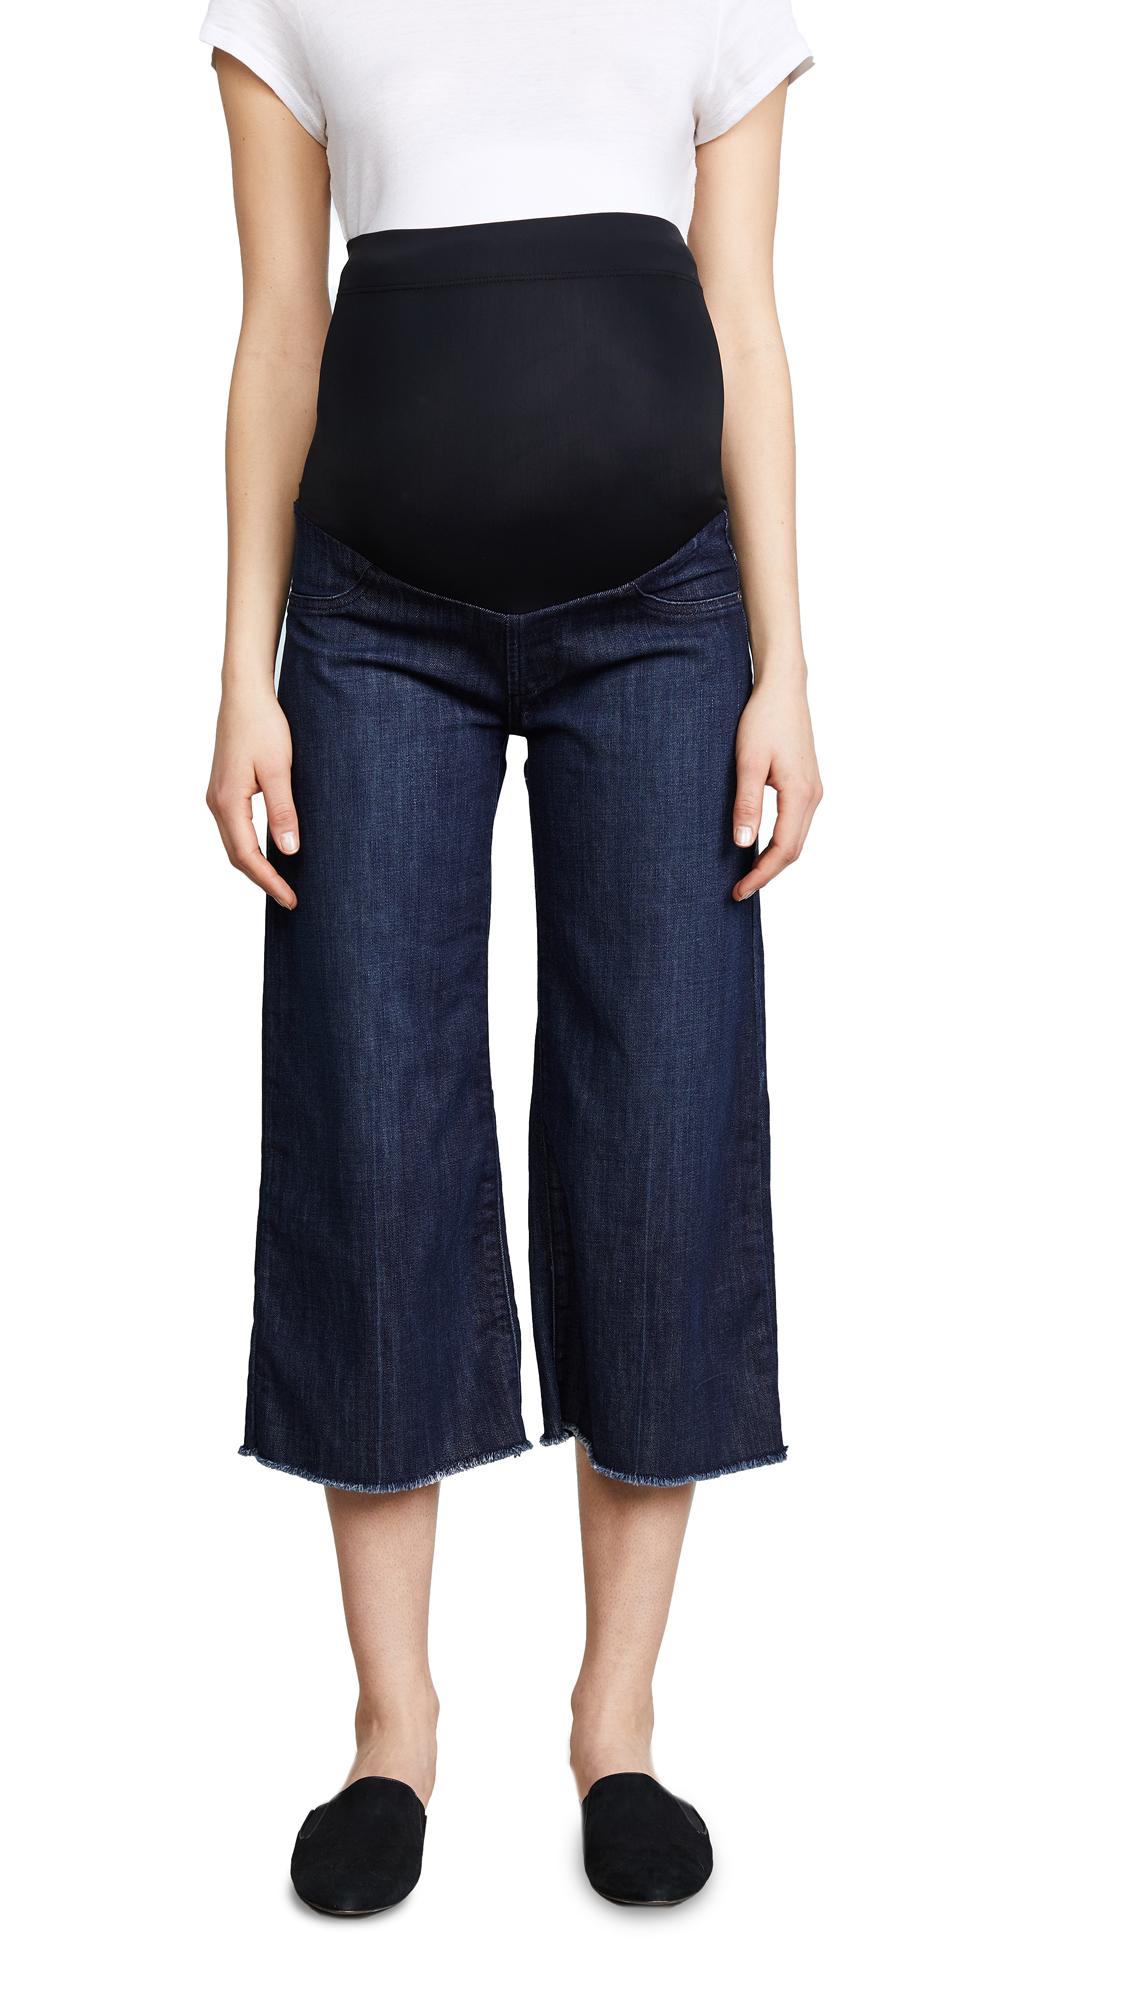 Carlotta Maternity Jeans, Siren